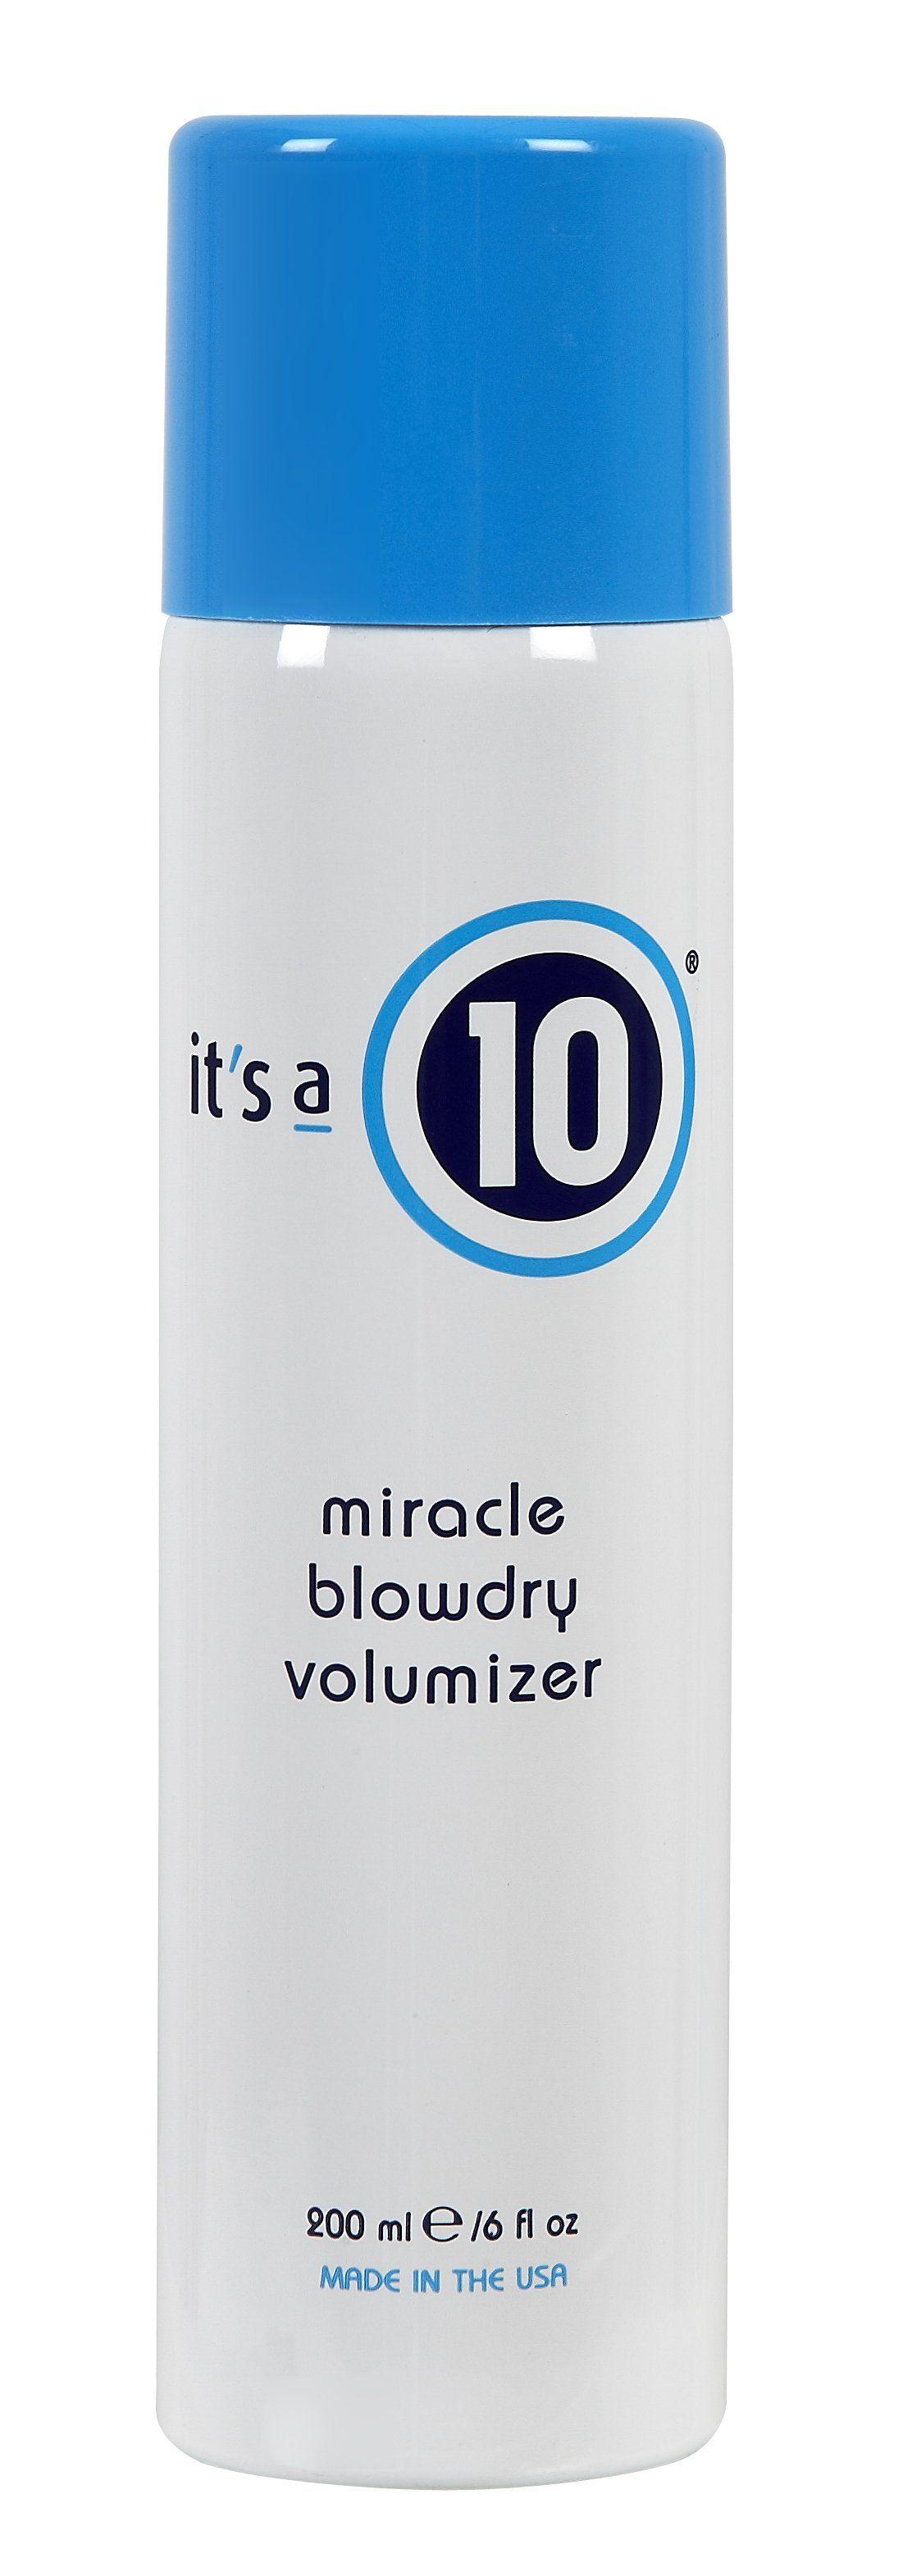 Miracle Blowdry Volumizer Blow dry, 10 things, Miracles